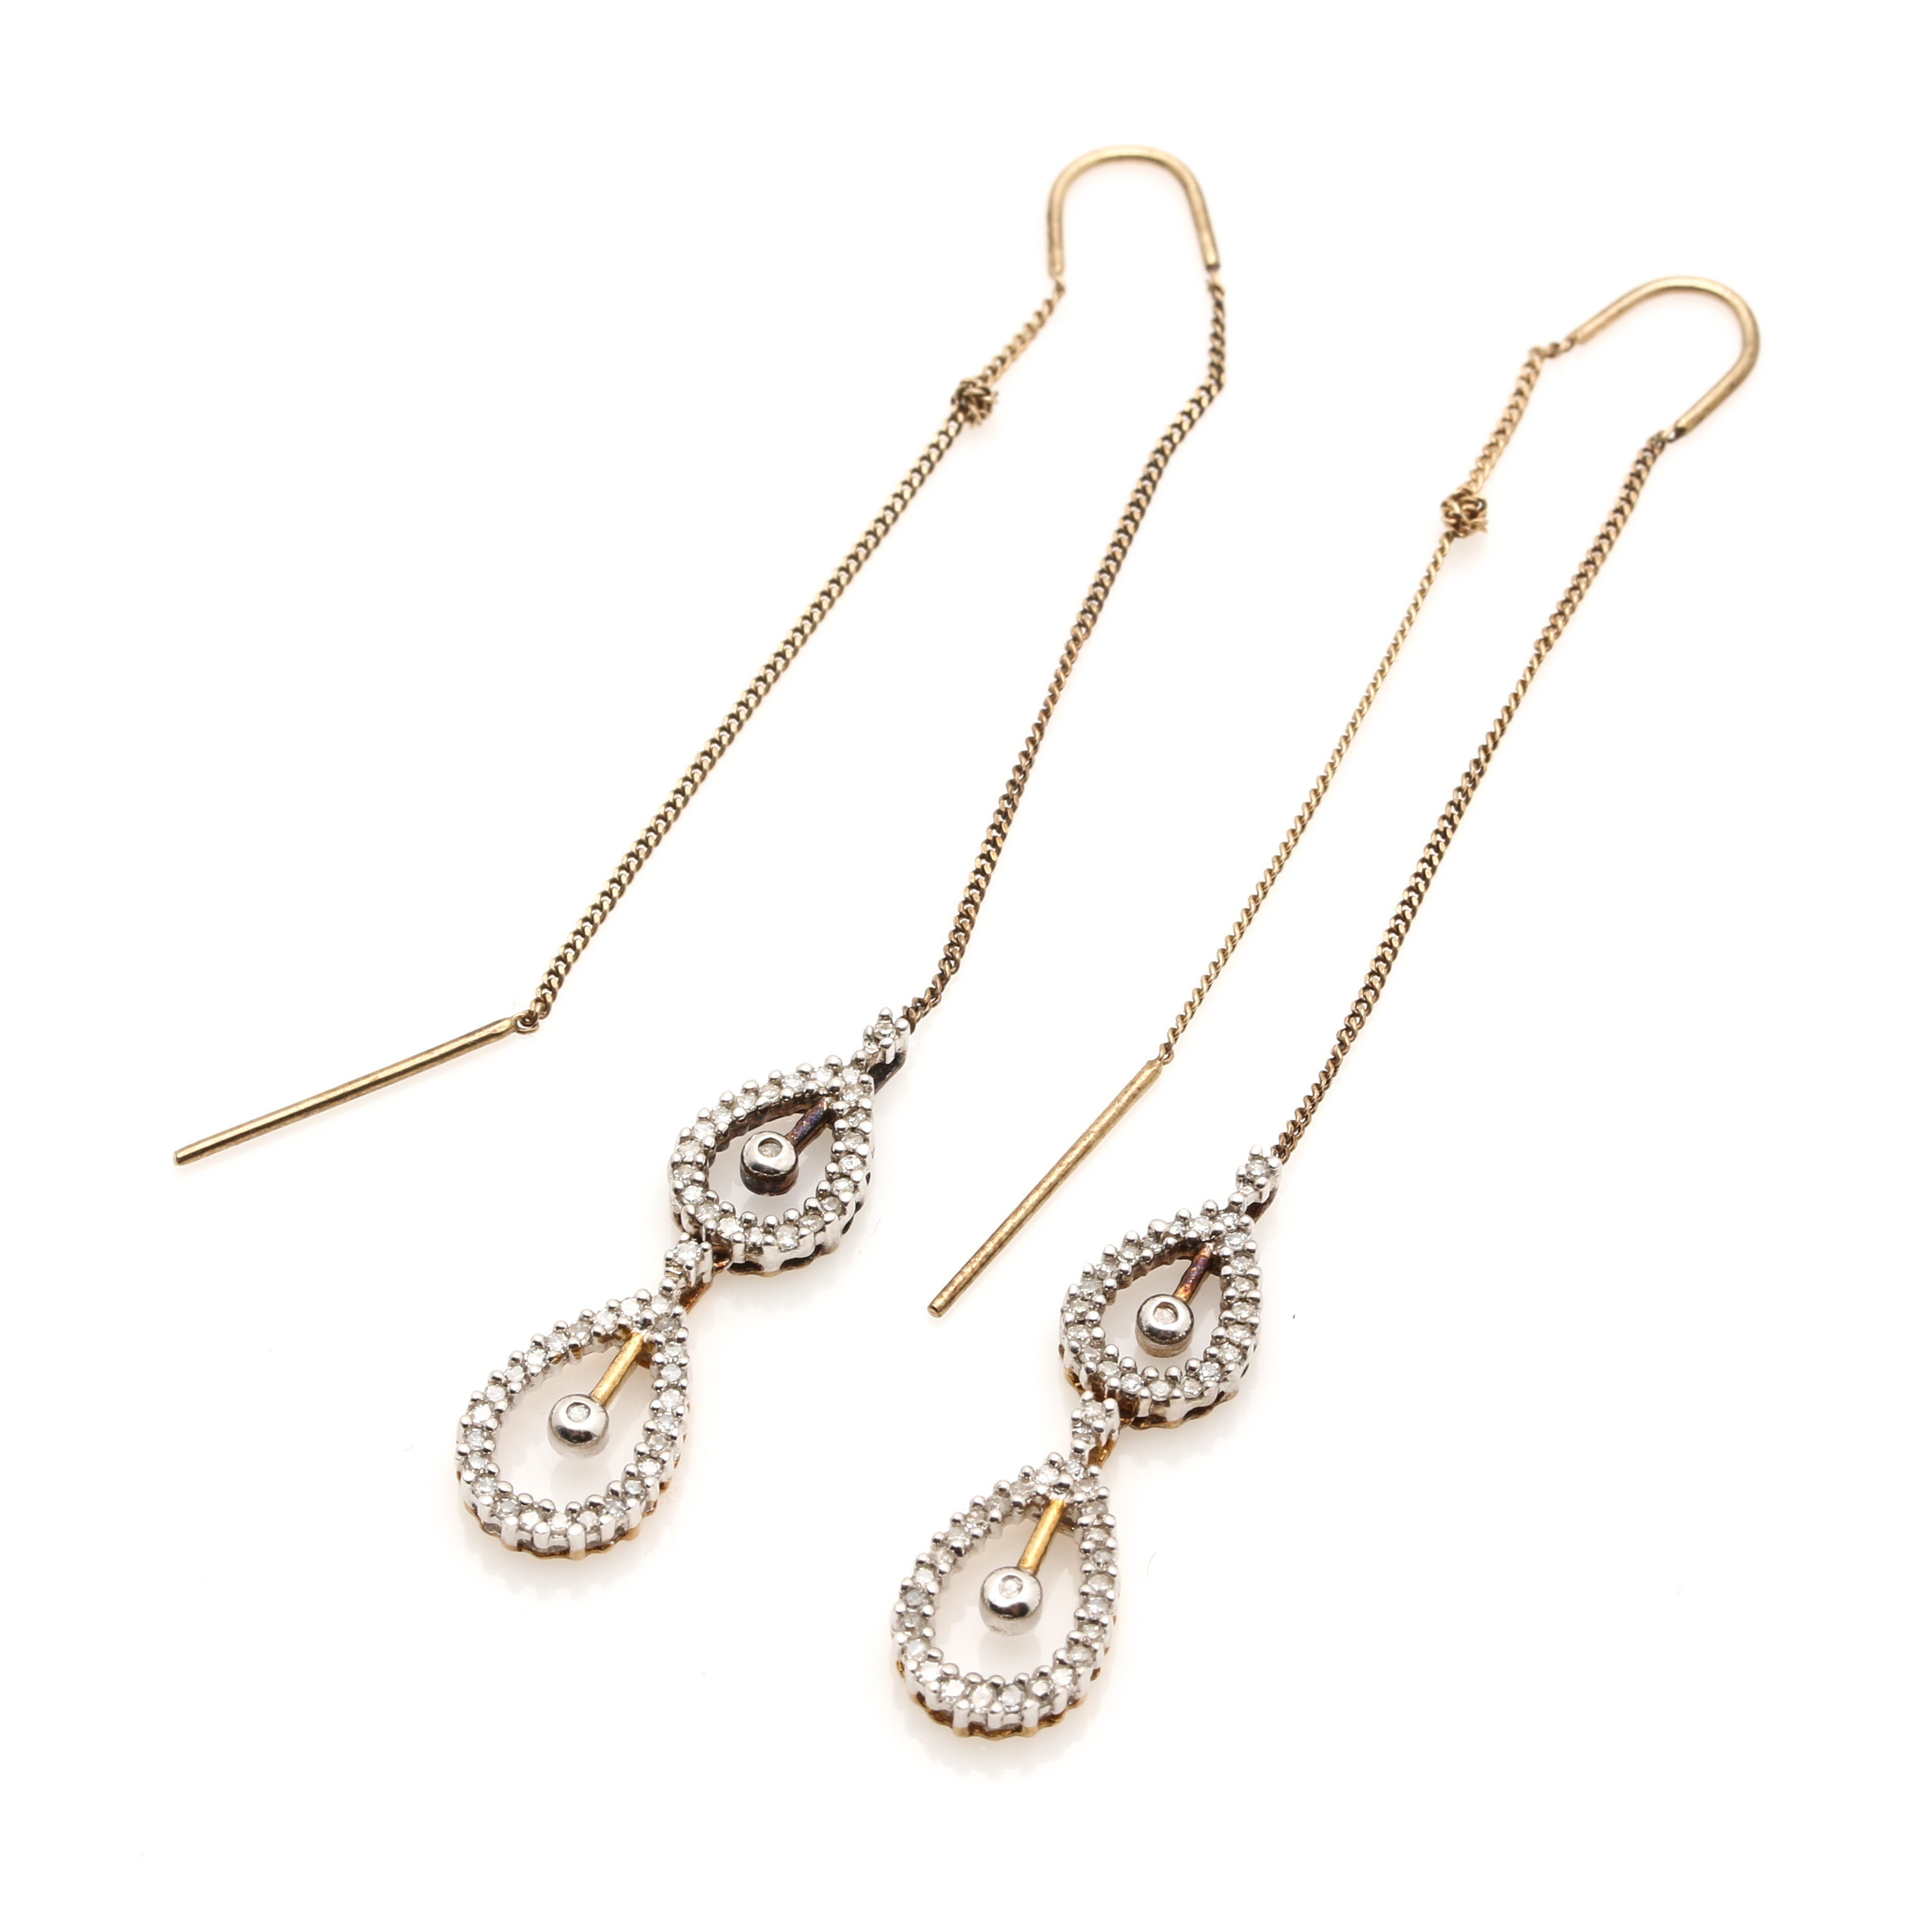 10K Yellow Gold Diamond Threader Earrings EBTH